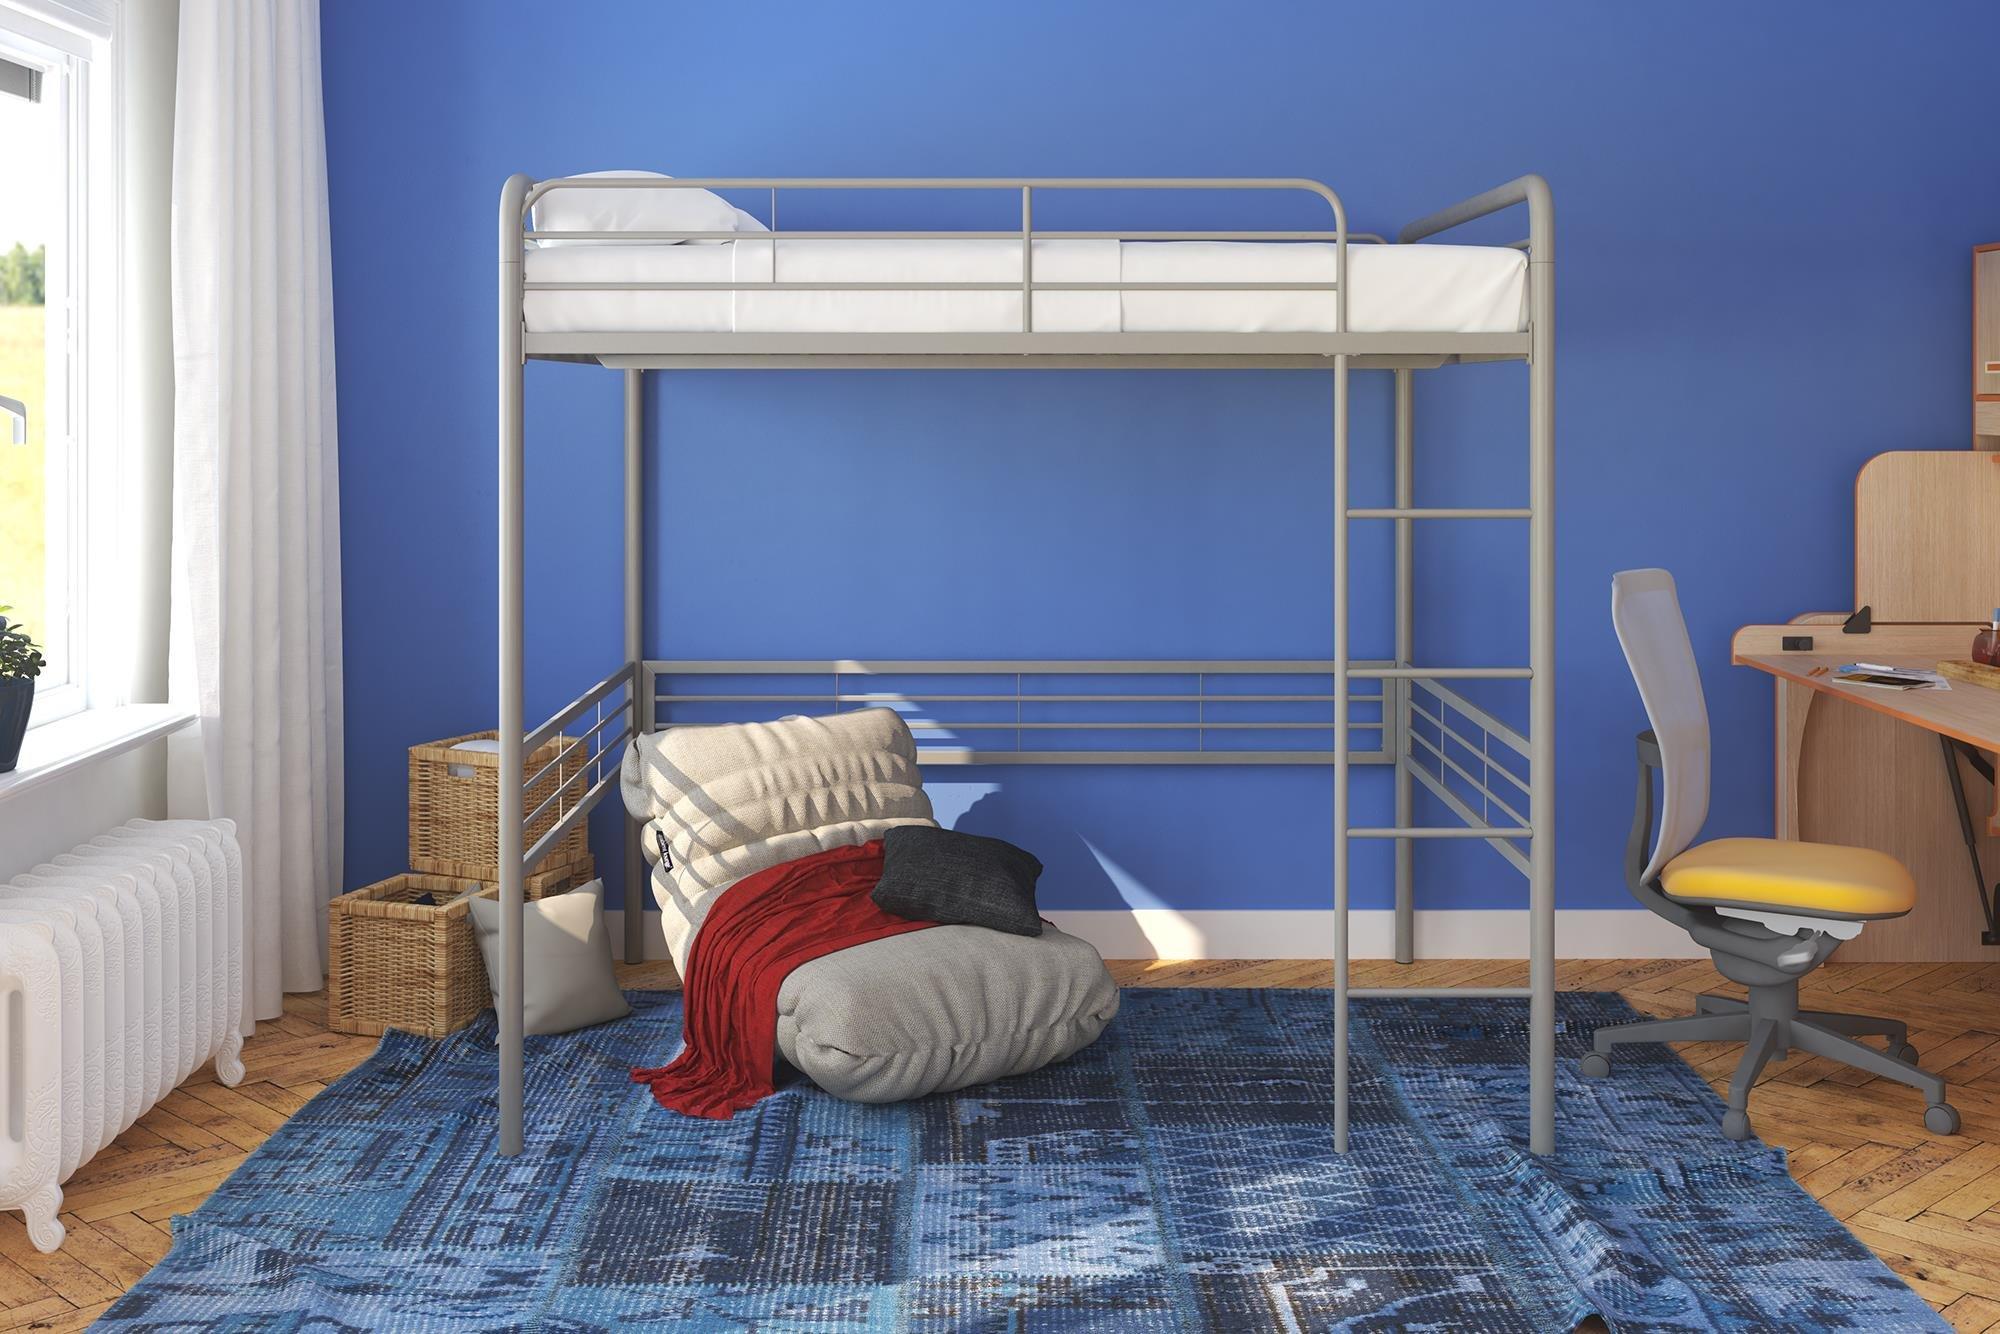 DHP Silver Metal Loft Bed with Signature Sleep Memoir 6-Inch Mattress, Kids Furniture Set, Full Size